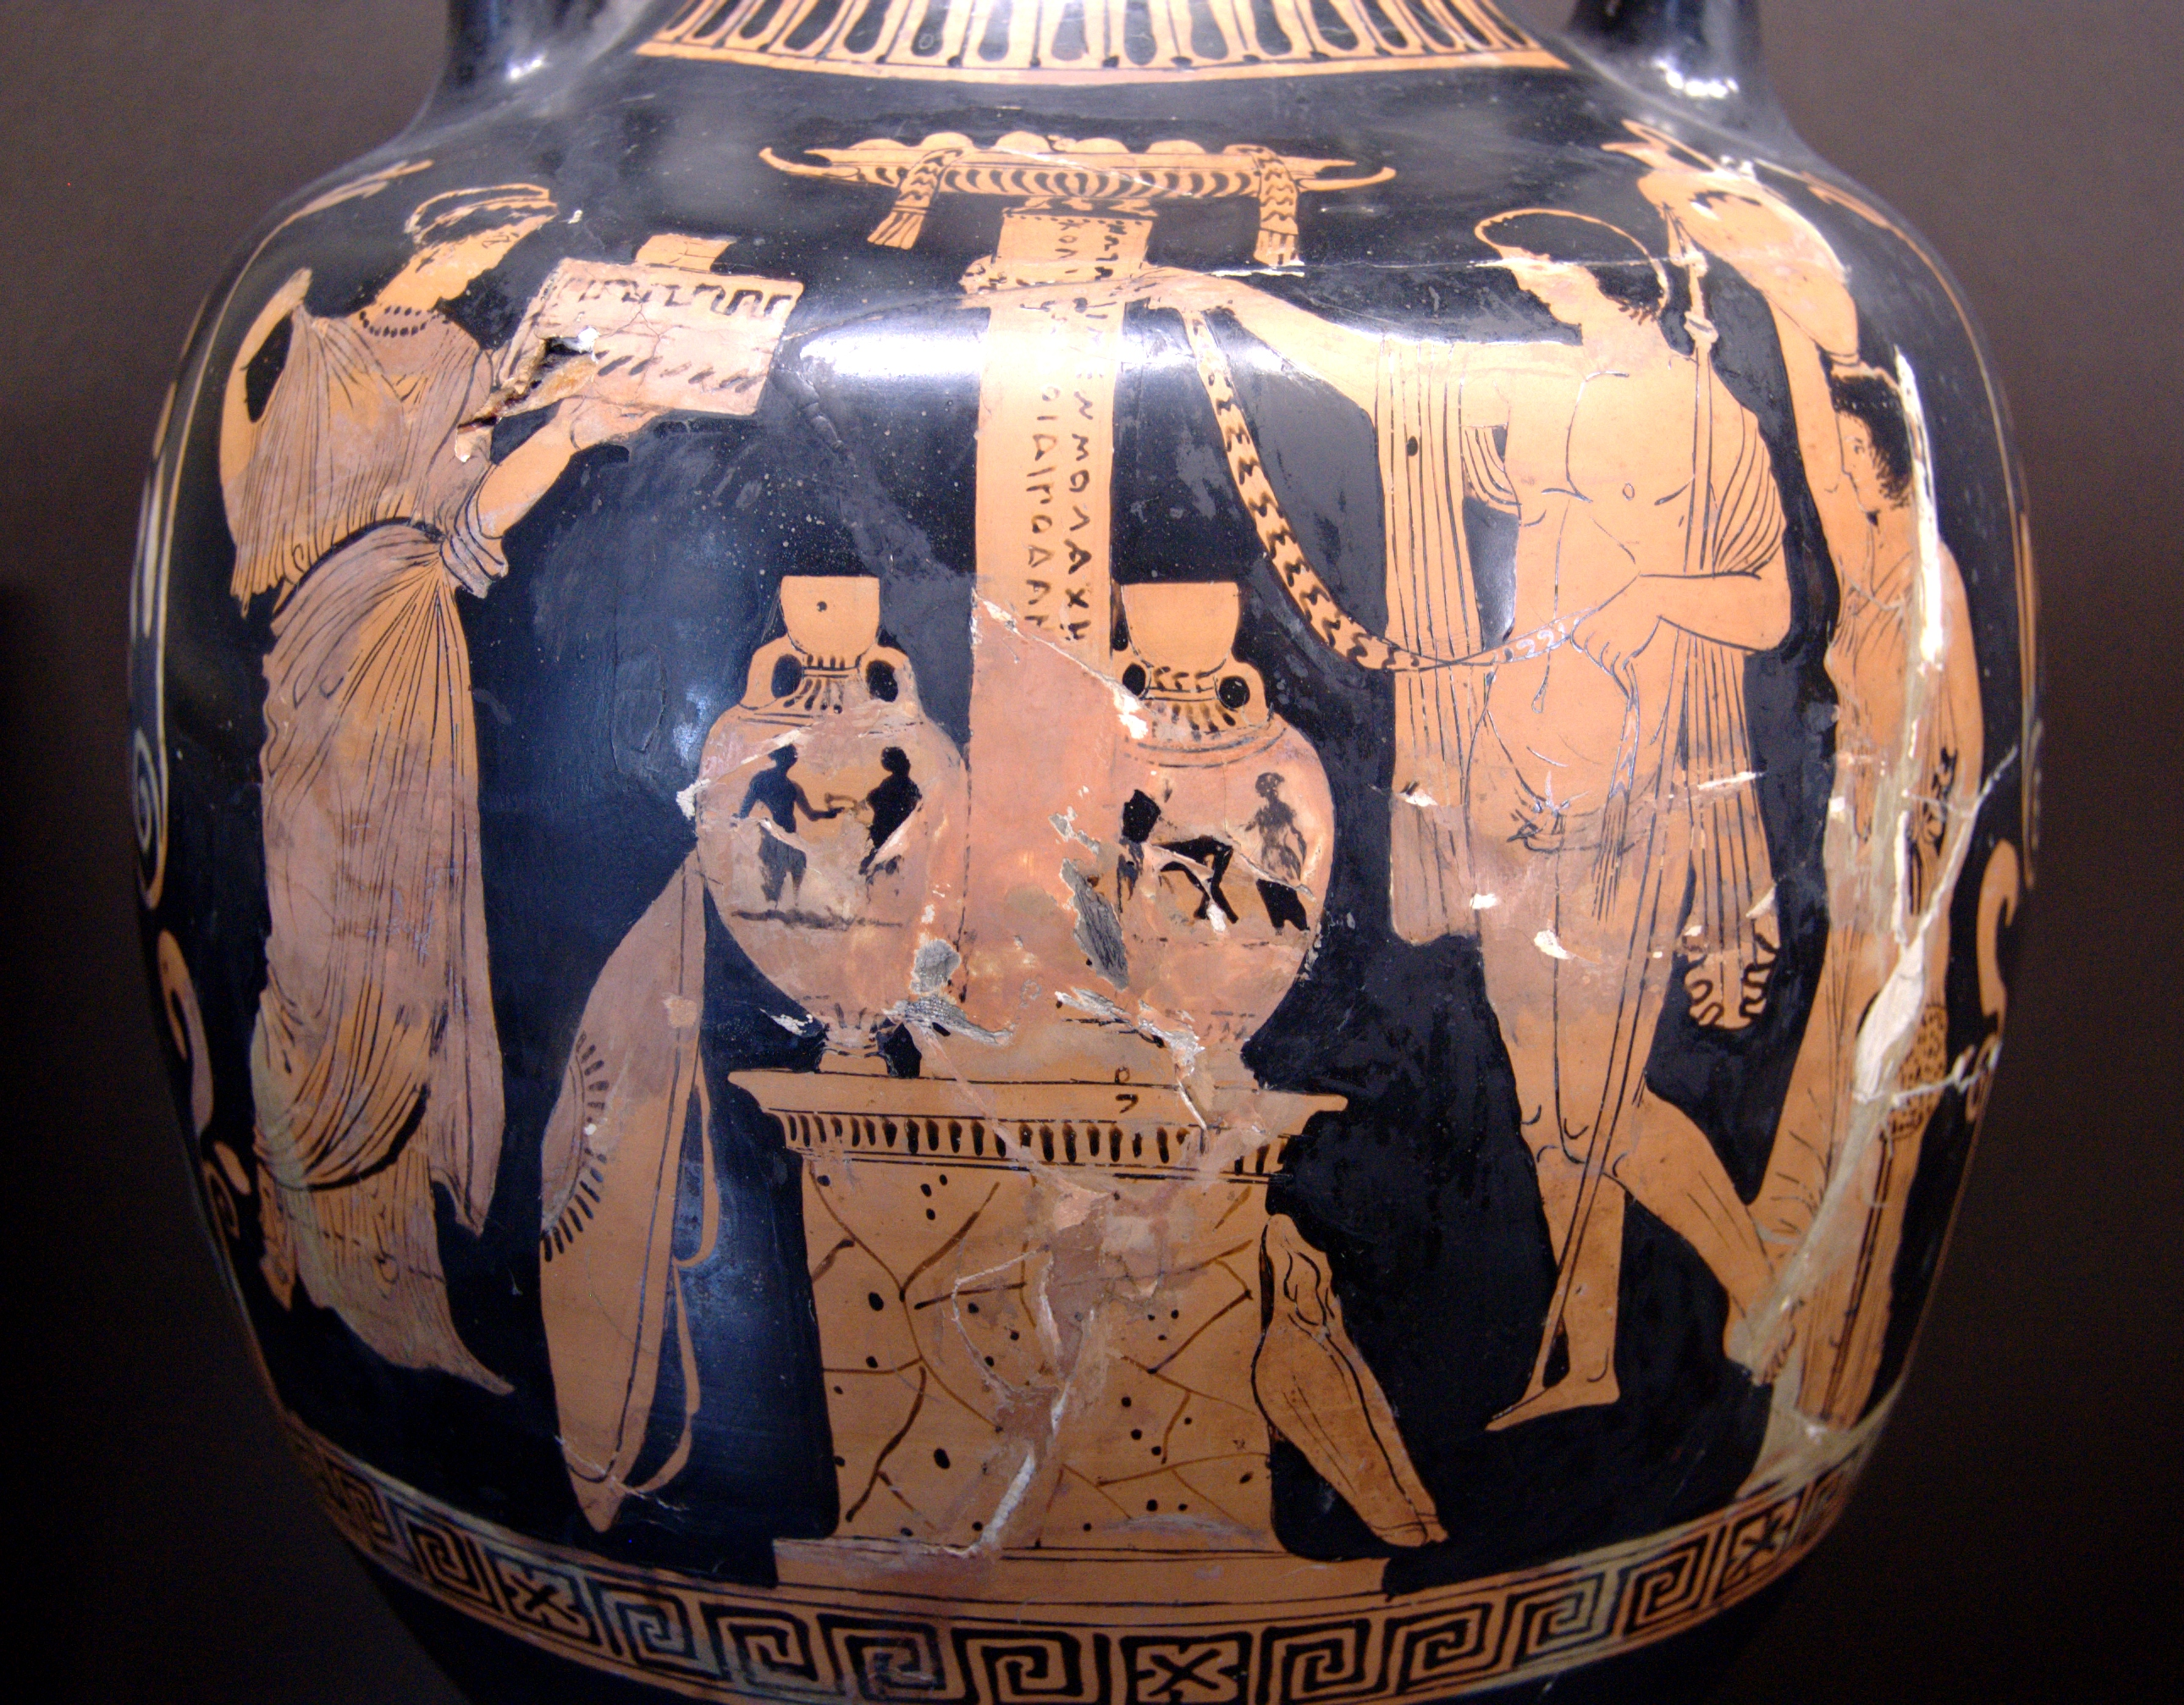 Depiction of Culto heroico griego